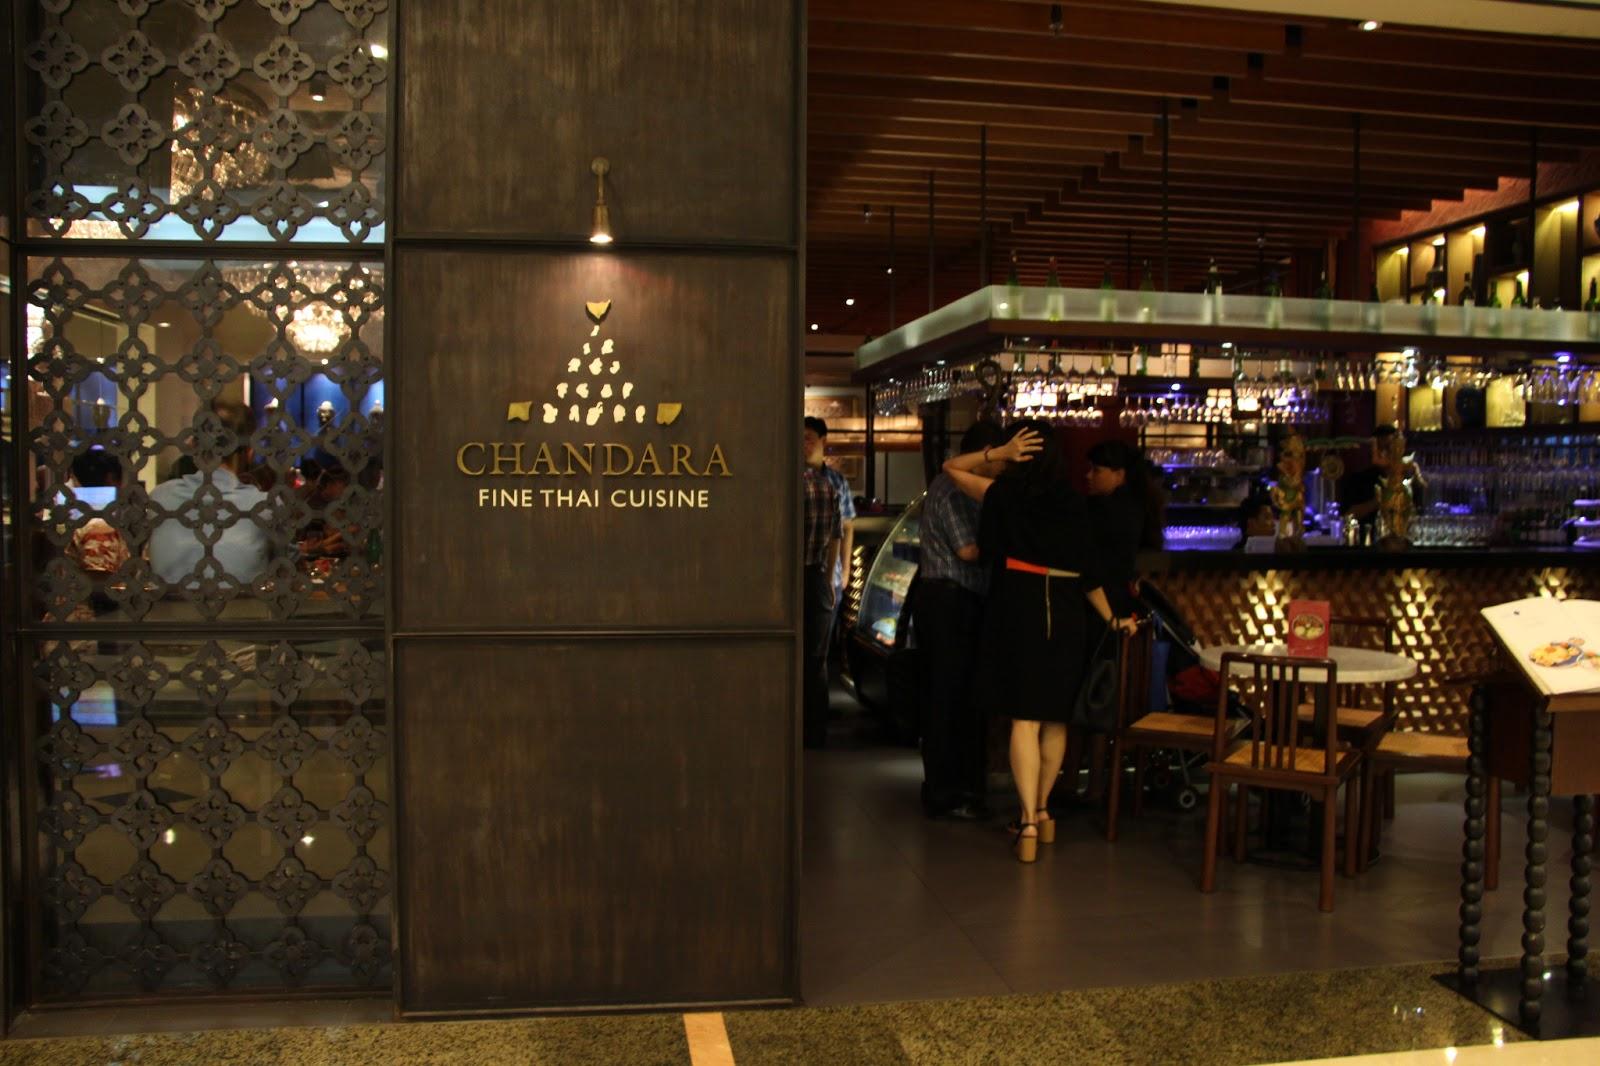 TOEVELGRAPH: Chandara Fine Thai Cuisine - restoran thailand di jakarta